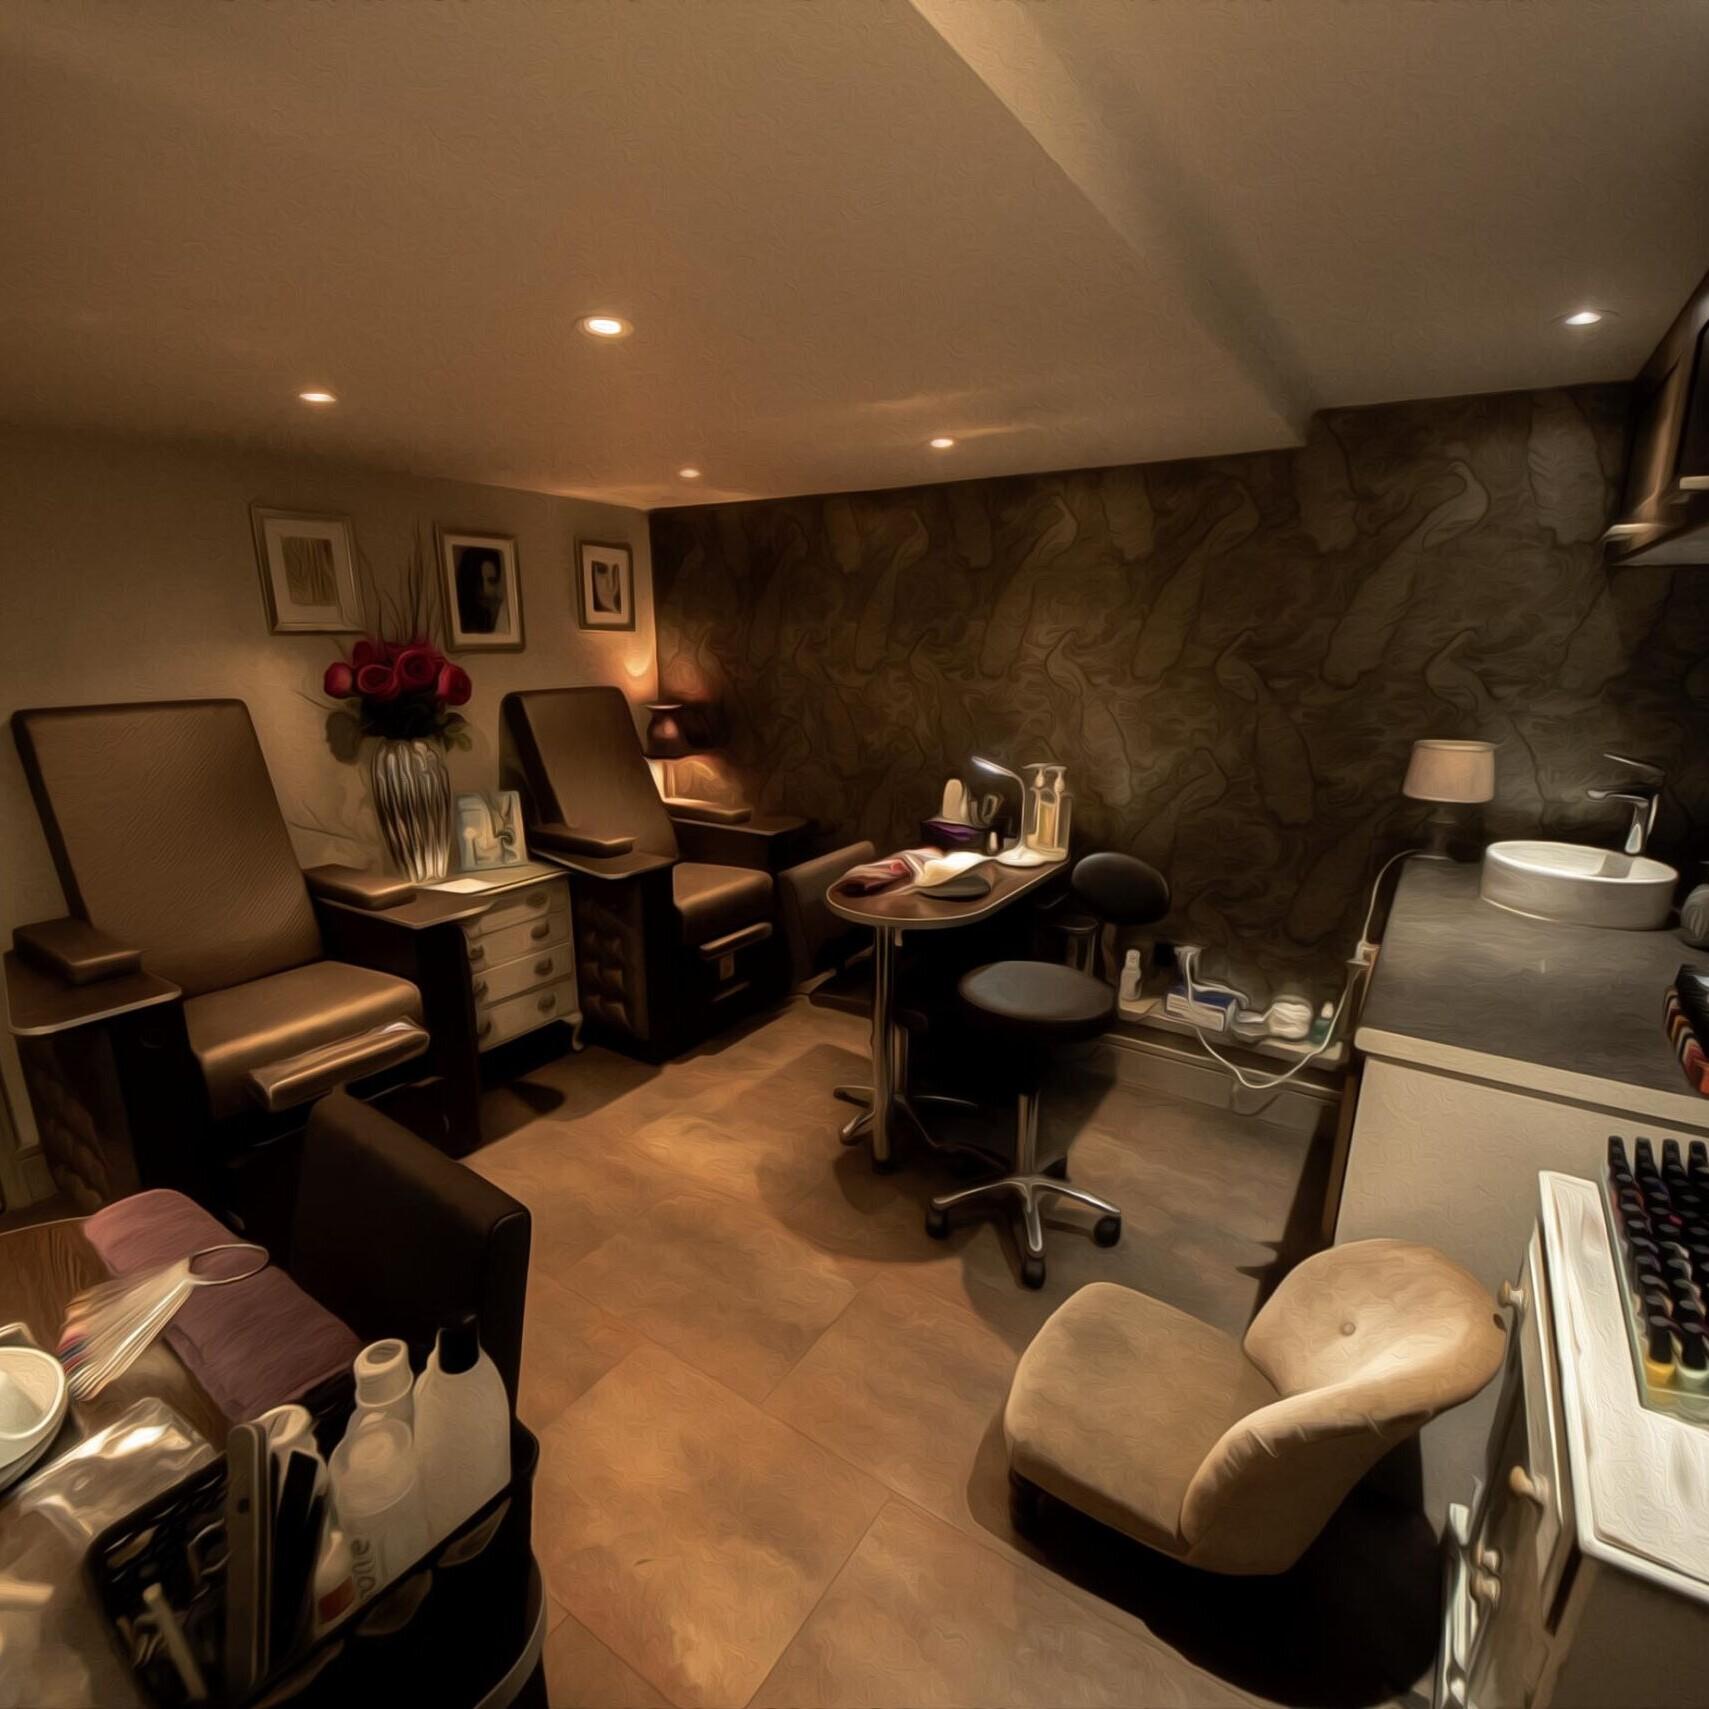 Our Beauty Salon Manicure/Pedicure Area in Amersham